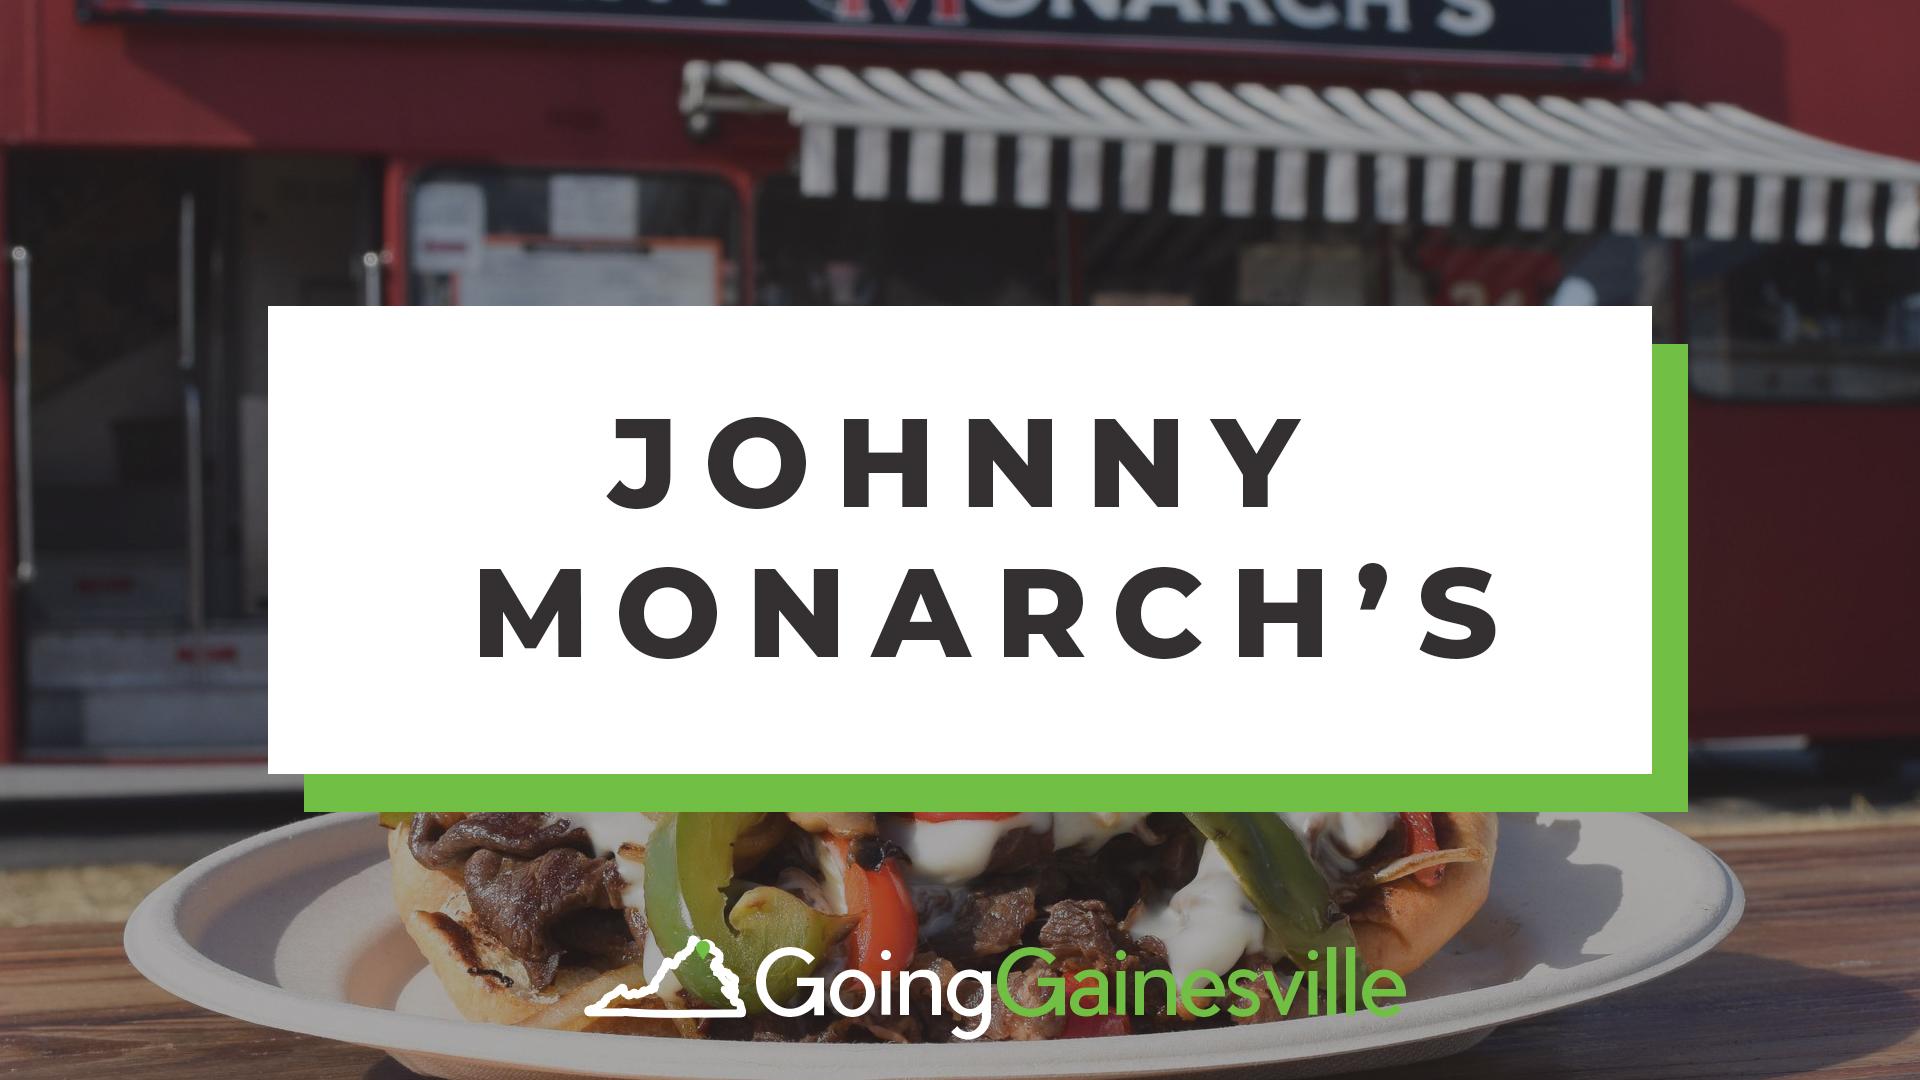 Johnny Monarch's